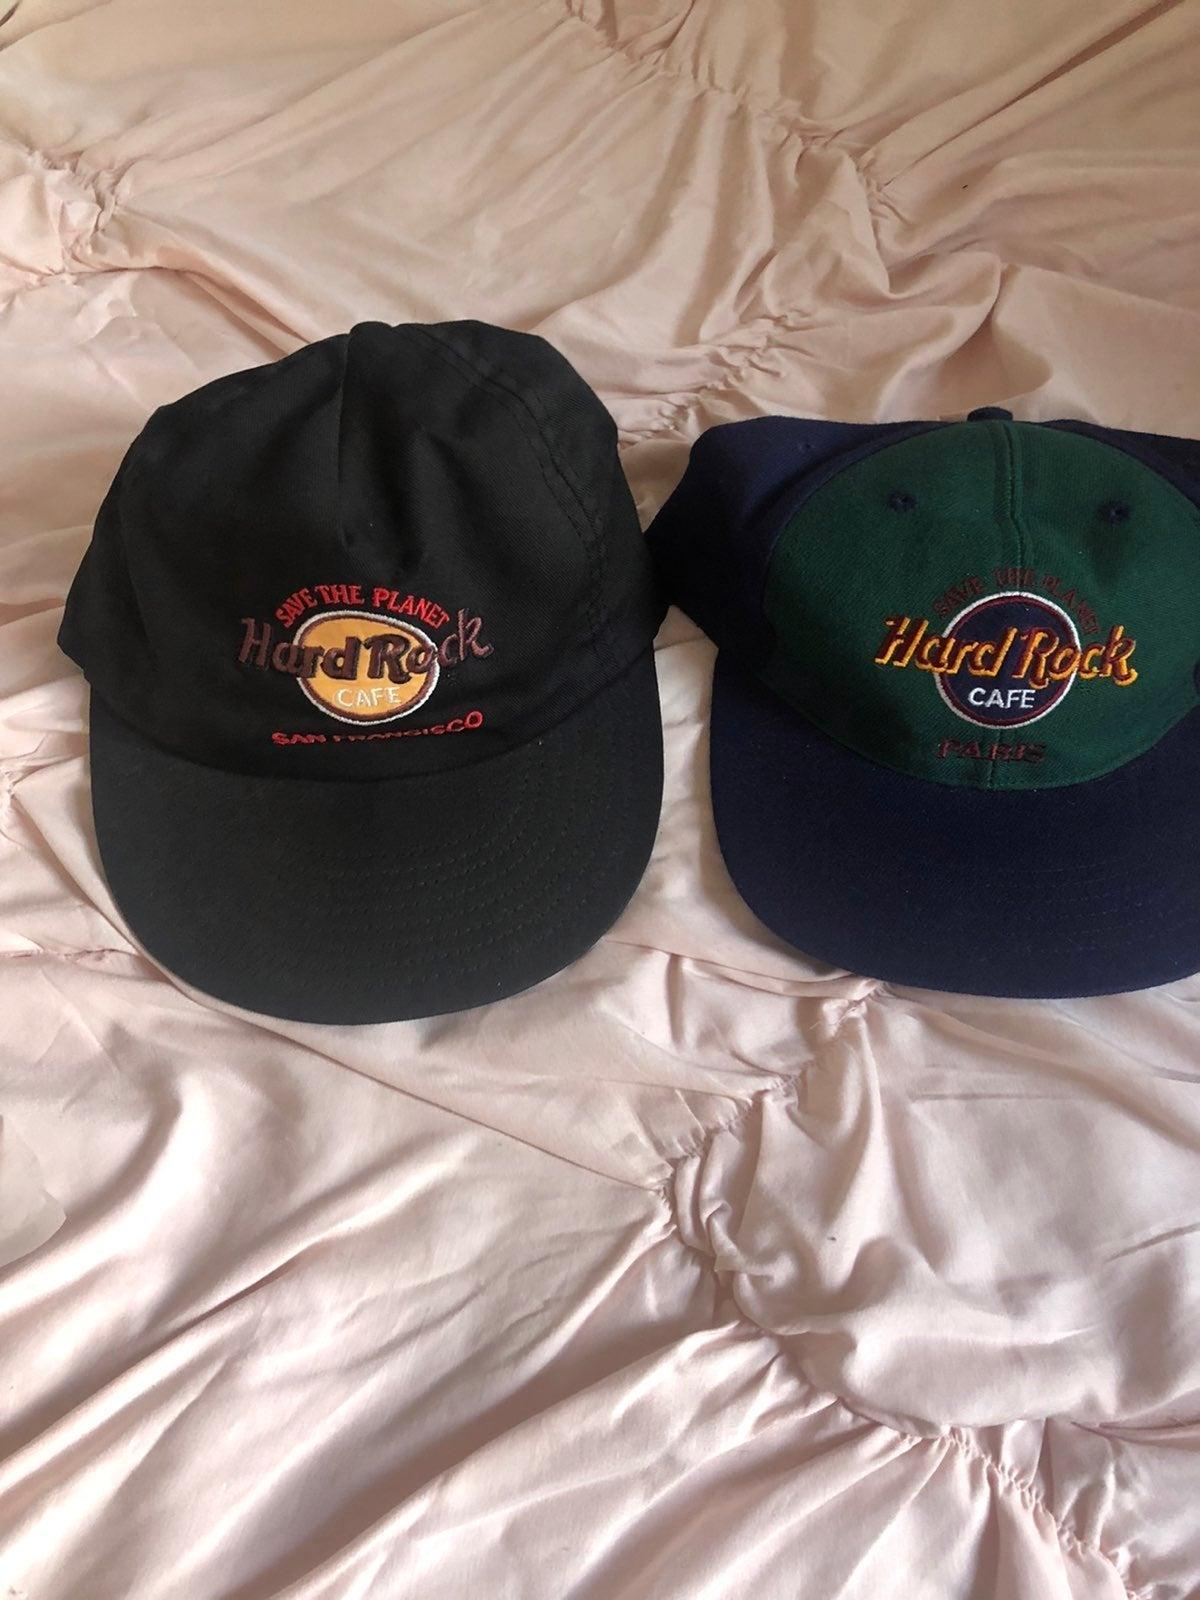 Hardrock cap collection